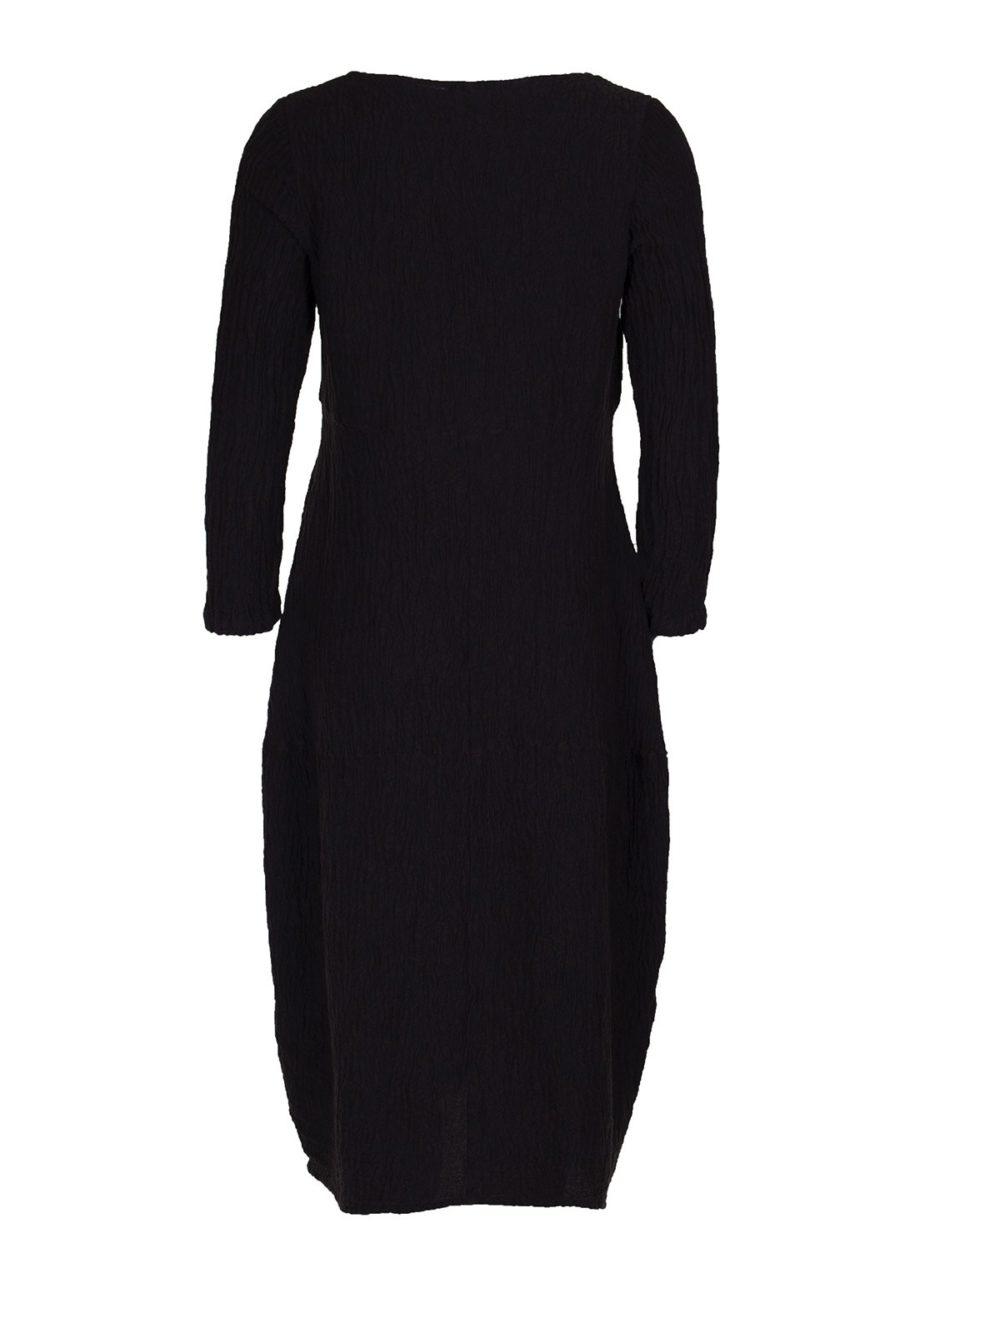 Dress 9405-S146